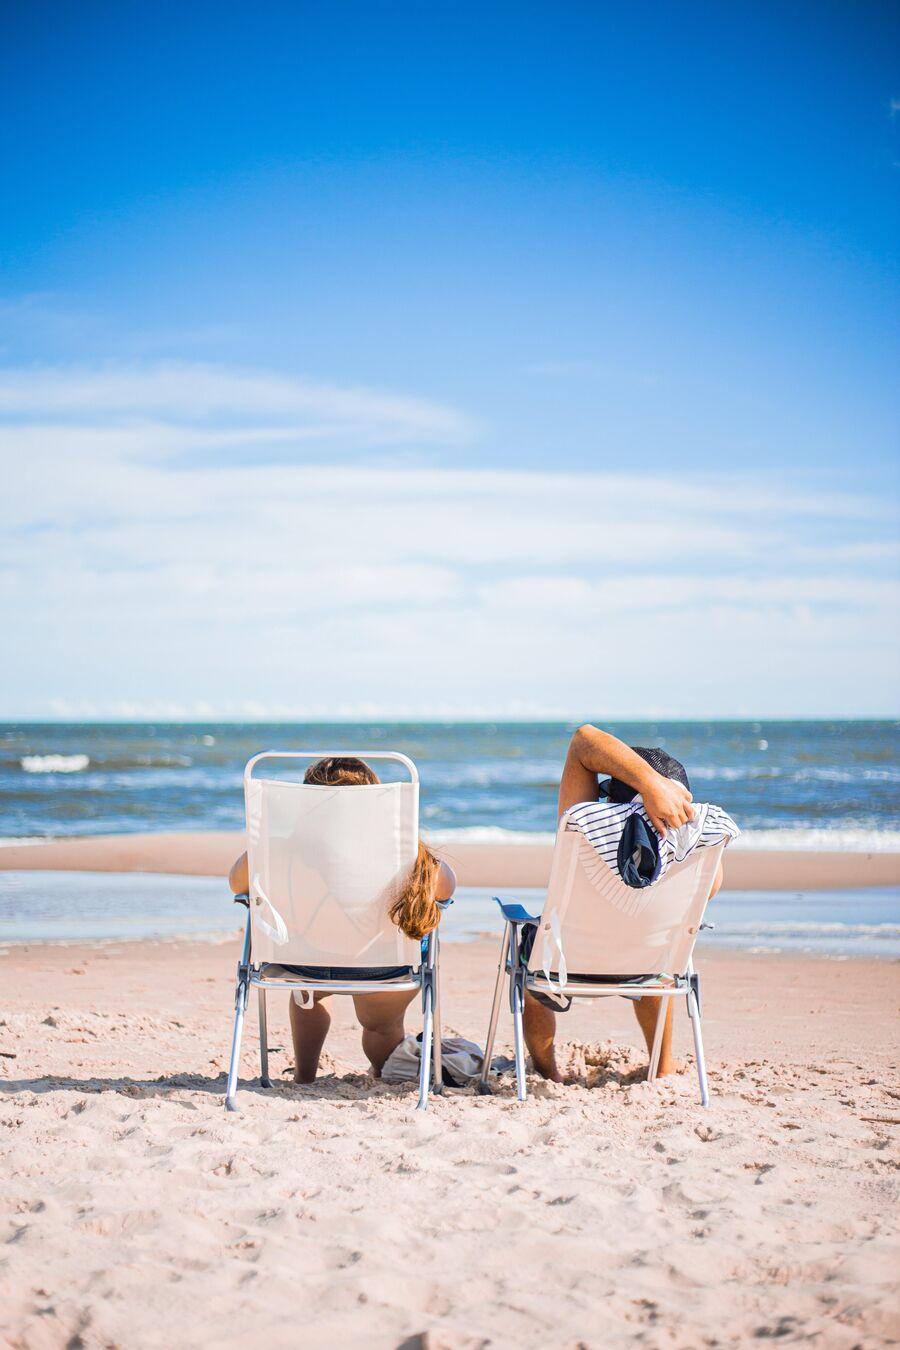 To personer på stranden. Foto: Ezequiel Garrido for Unsplash.